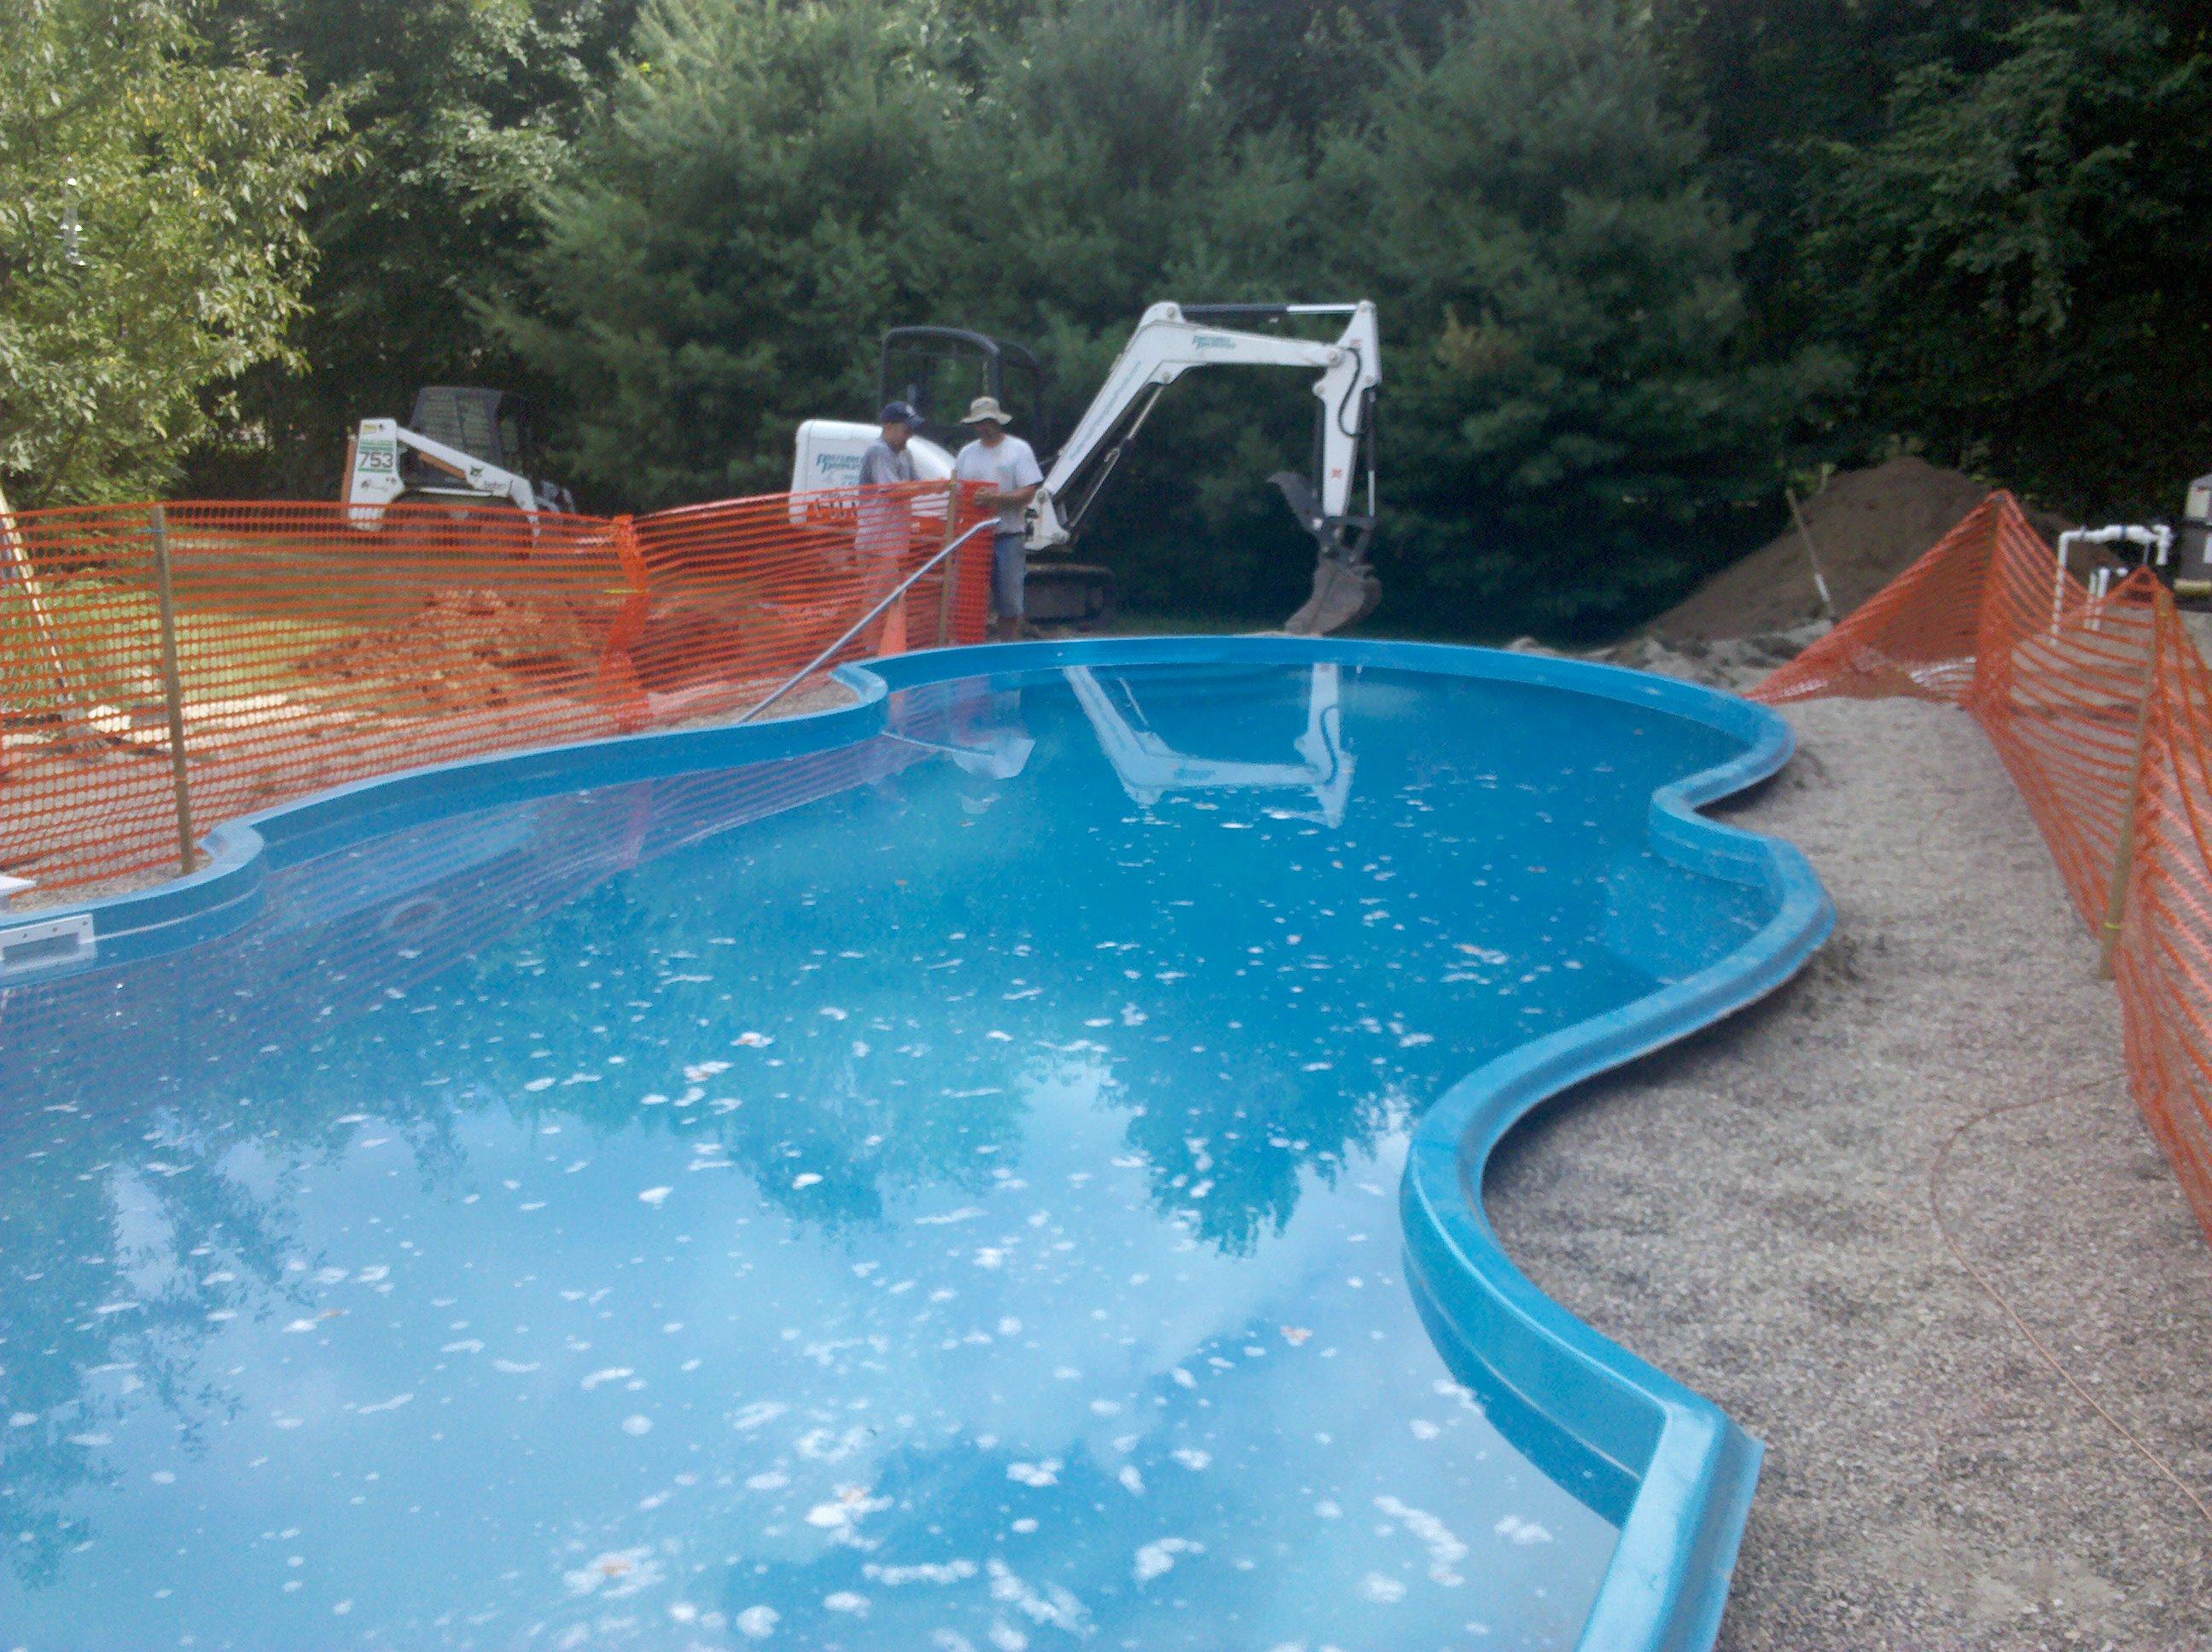 How to install a san juan fiberglass pool in just 2 days for Fiberglass pool installation